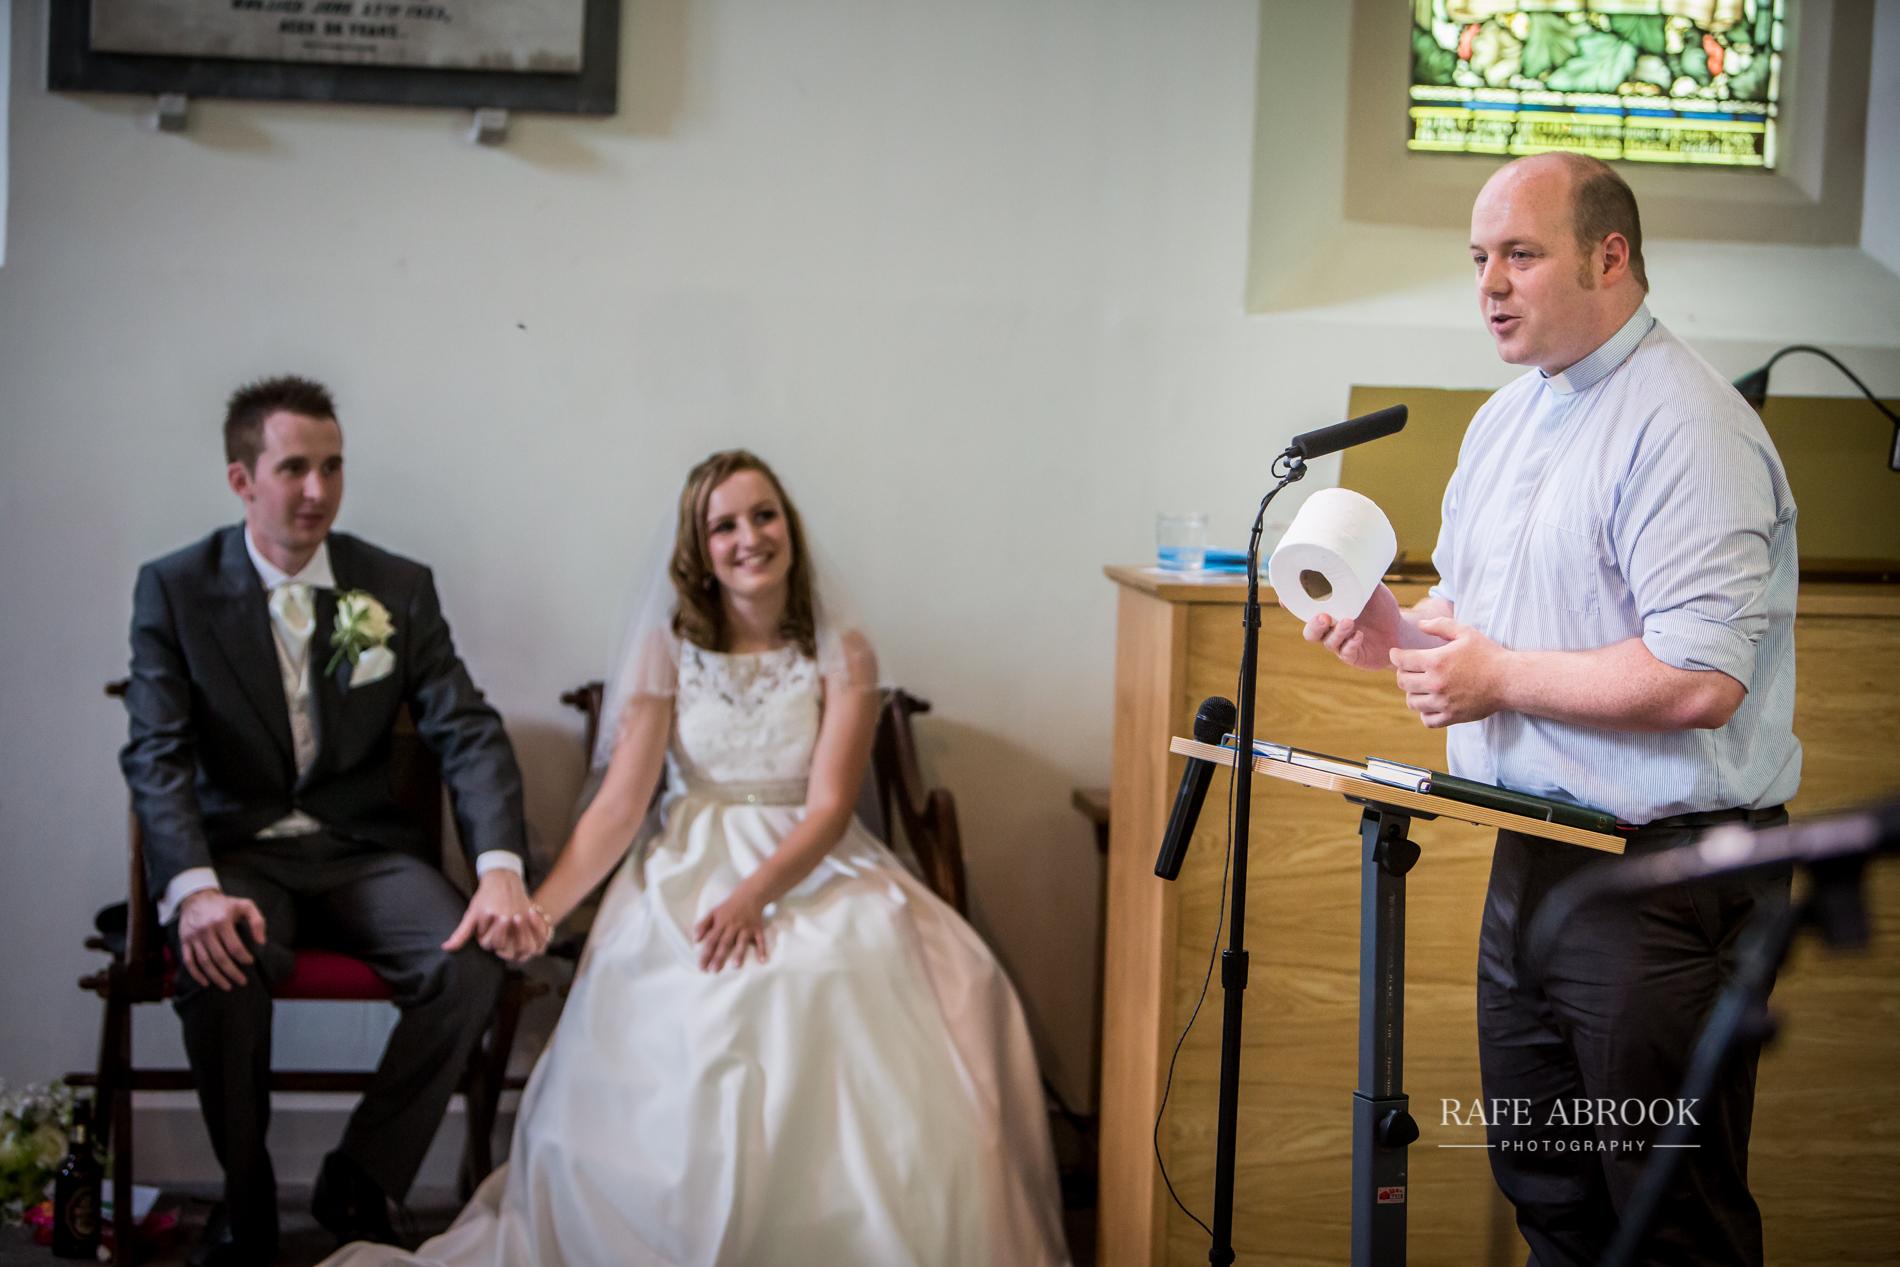 wedding photographer hertfordshire noke thistle hotel st albans -1166.jpg